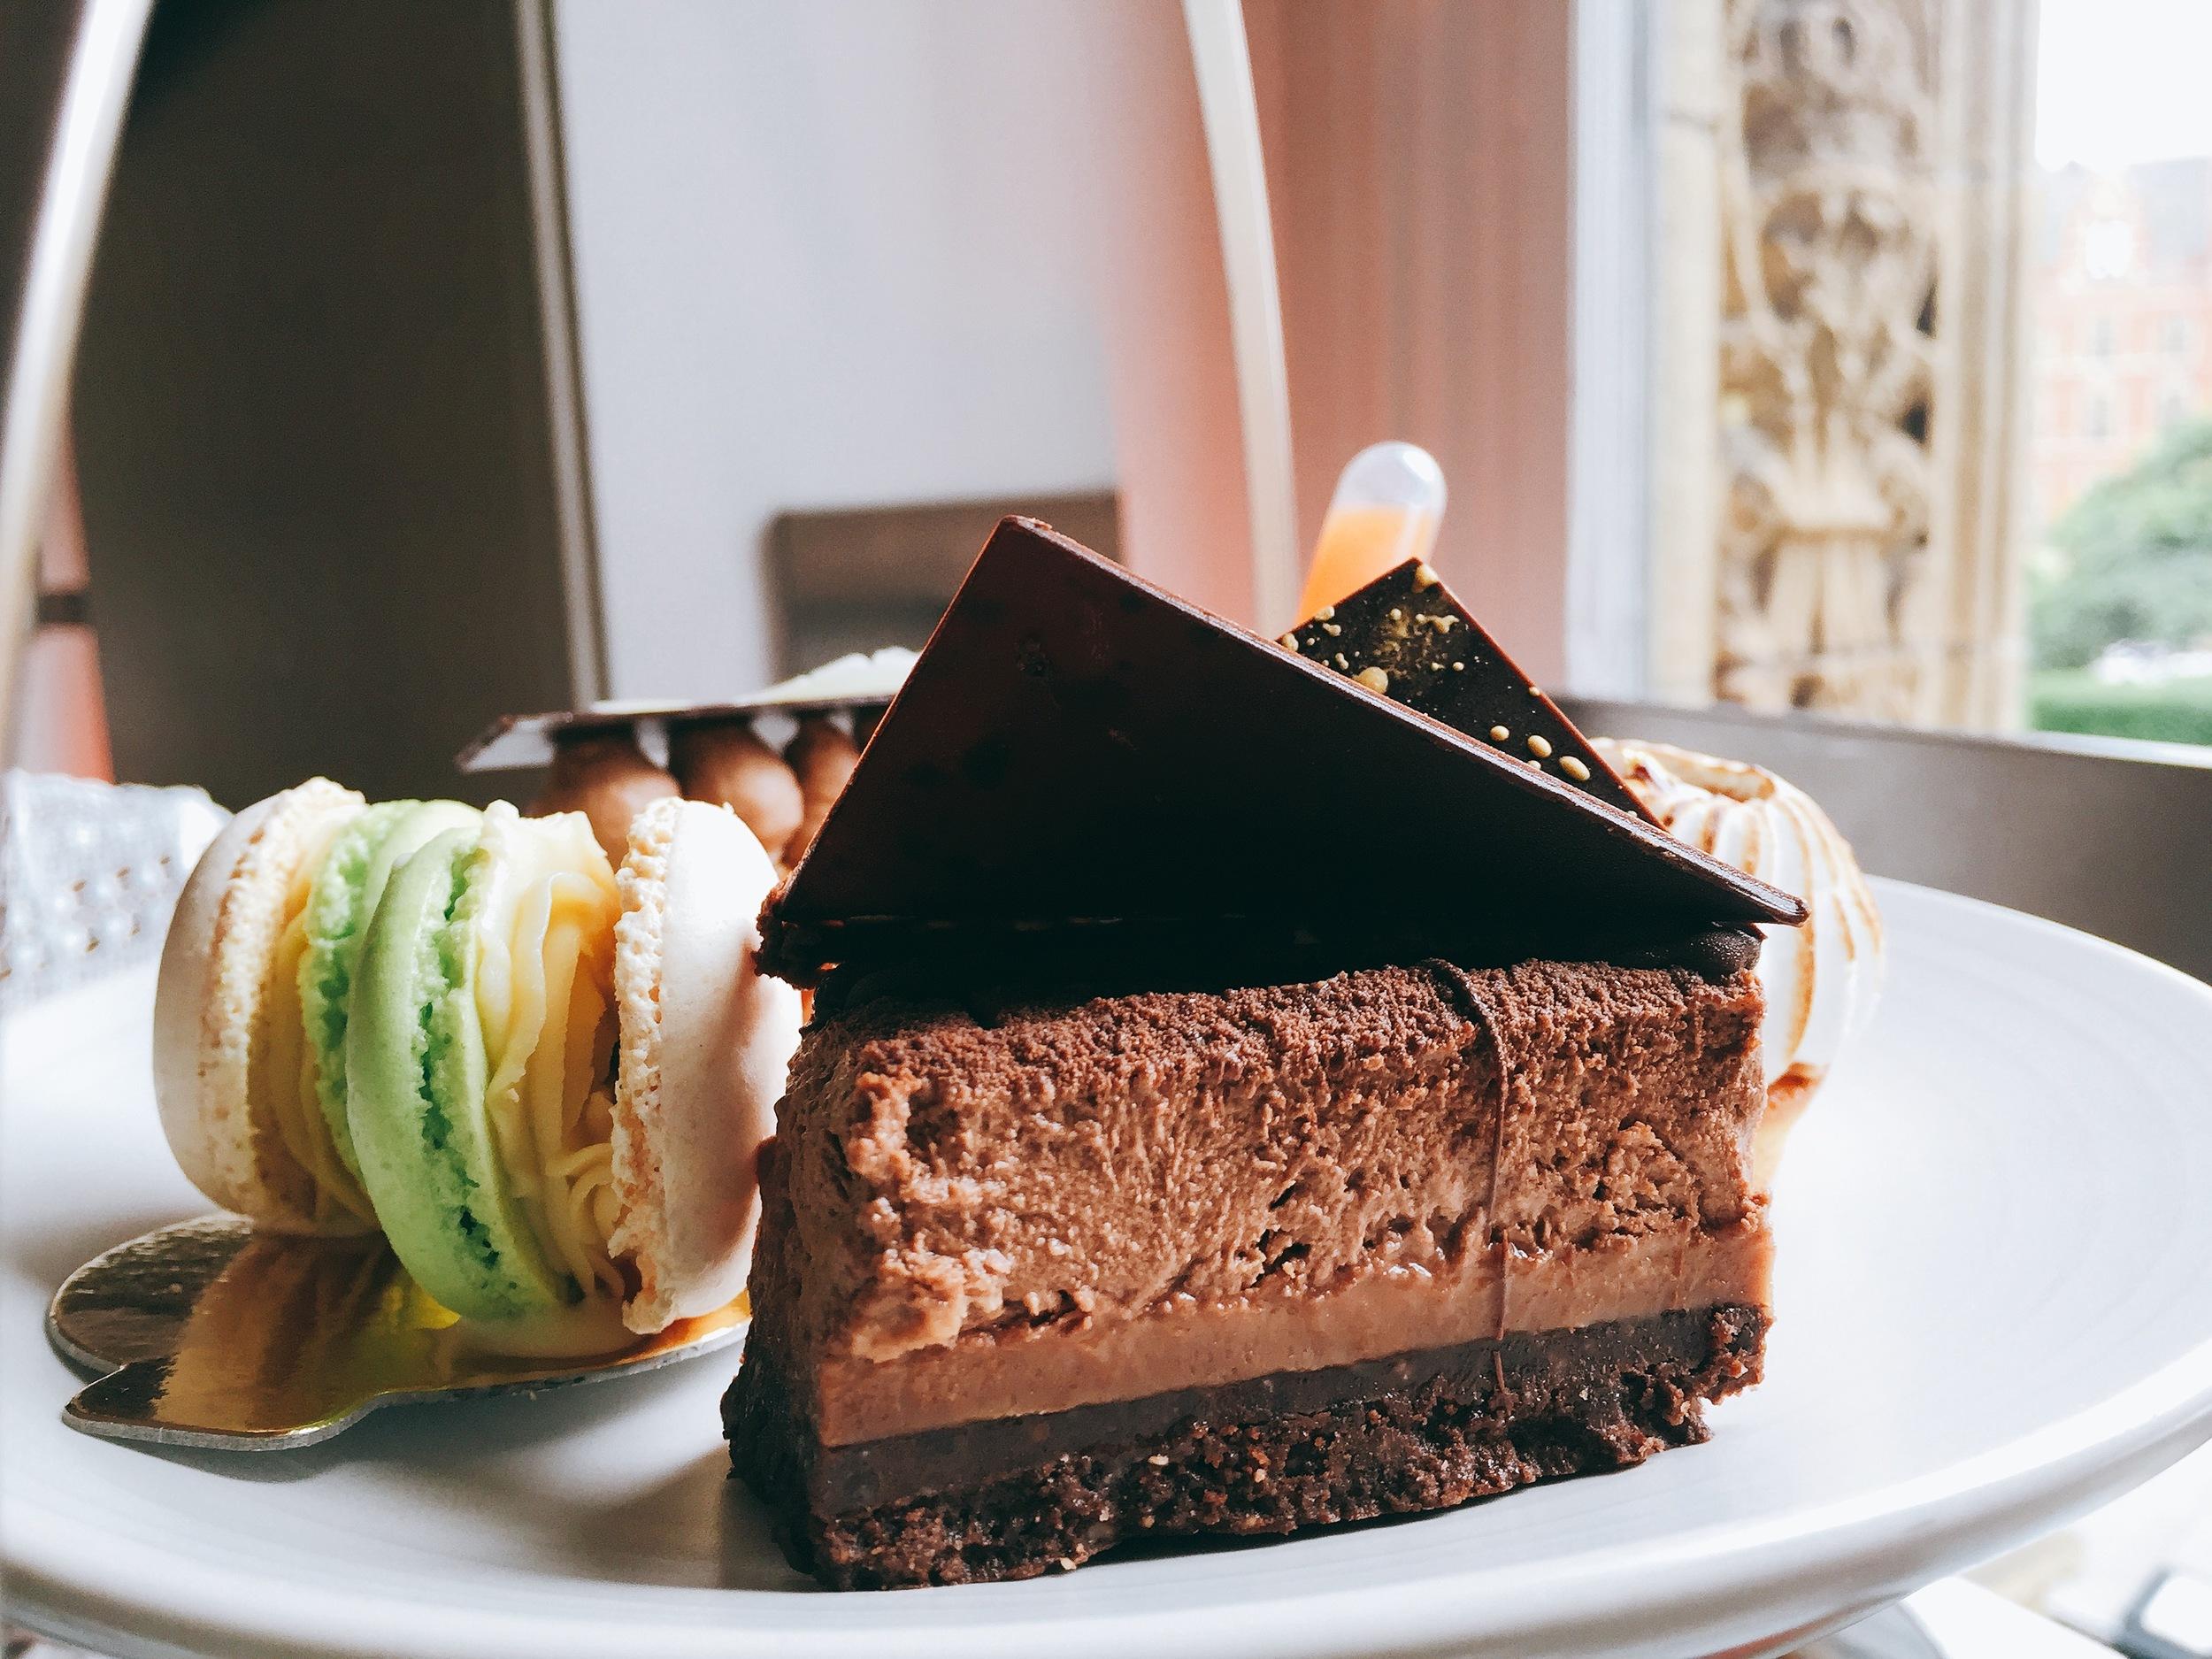 Chocolate - Afternoon Tea at the Royal Albert Hall